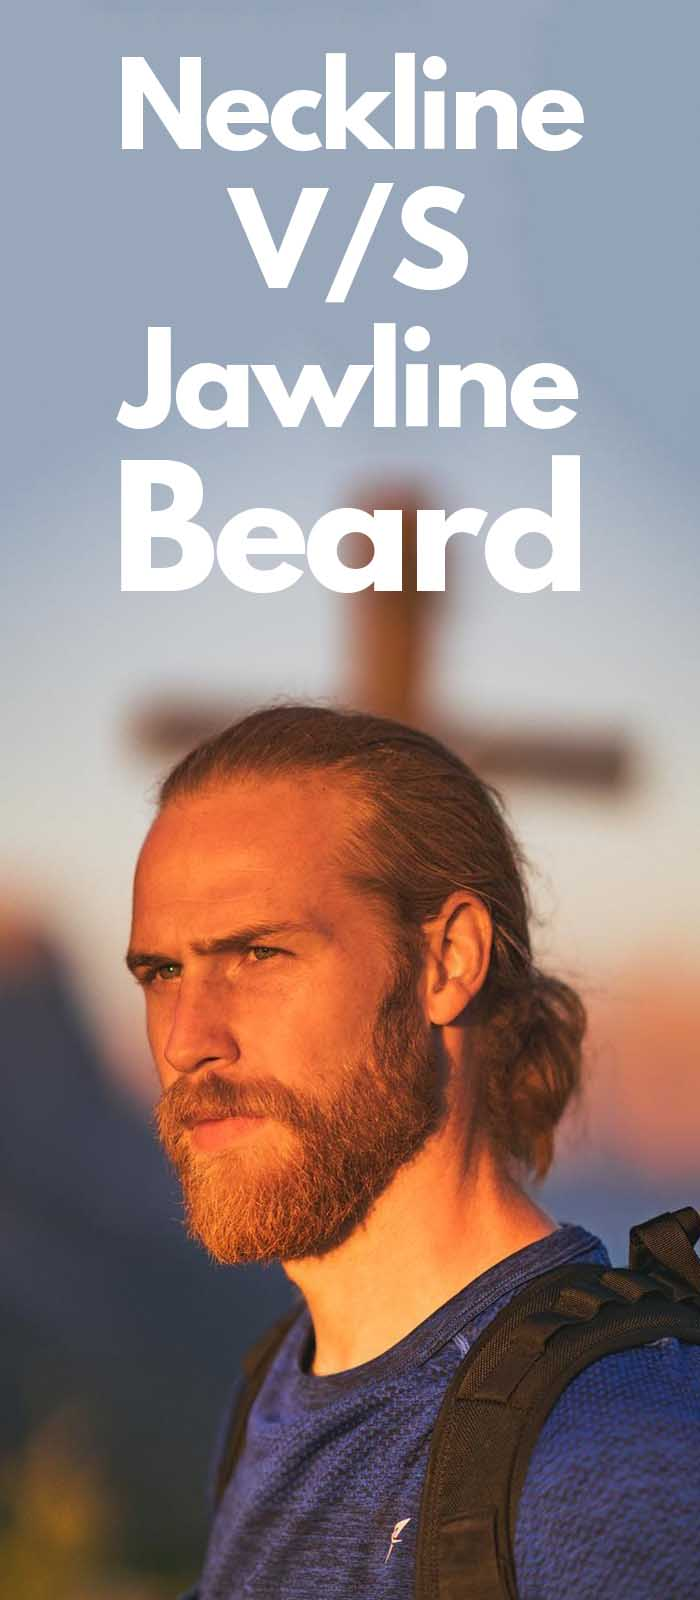 Neckline Beard VS Jawline Beard!